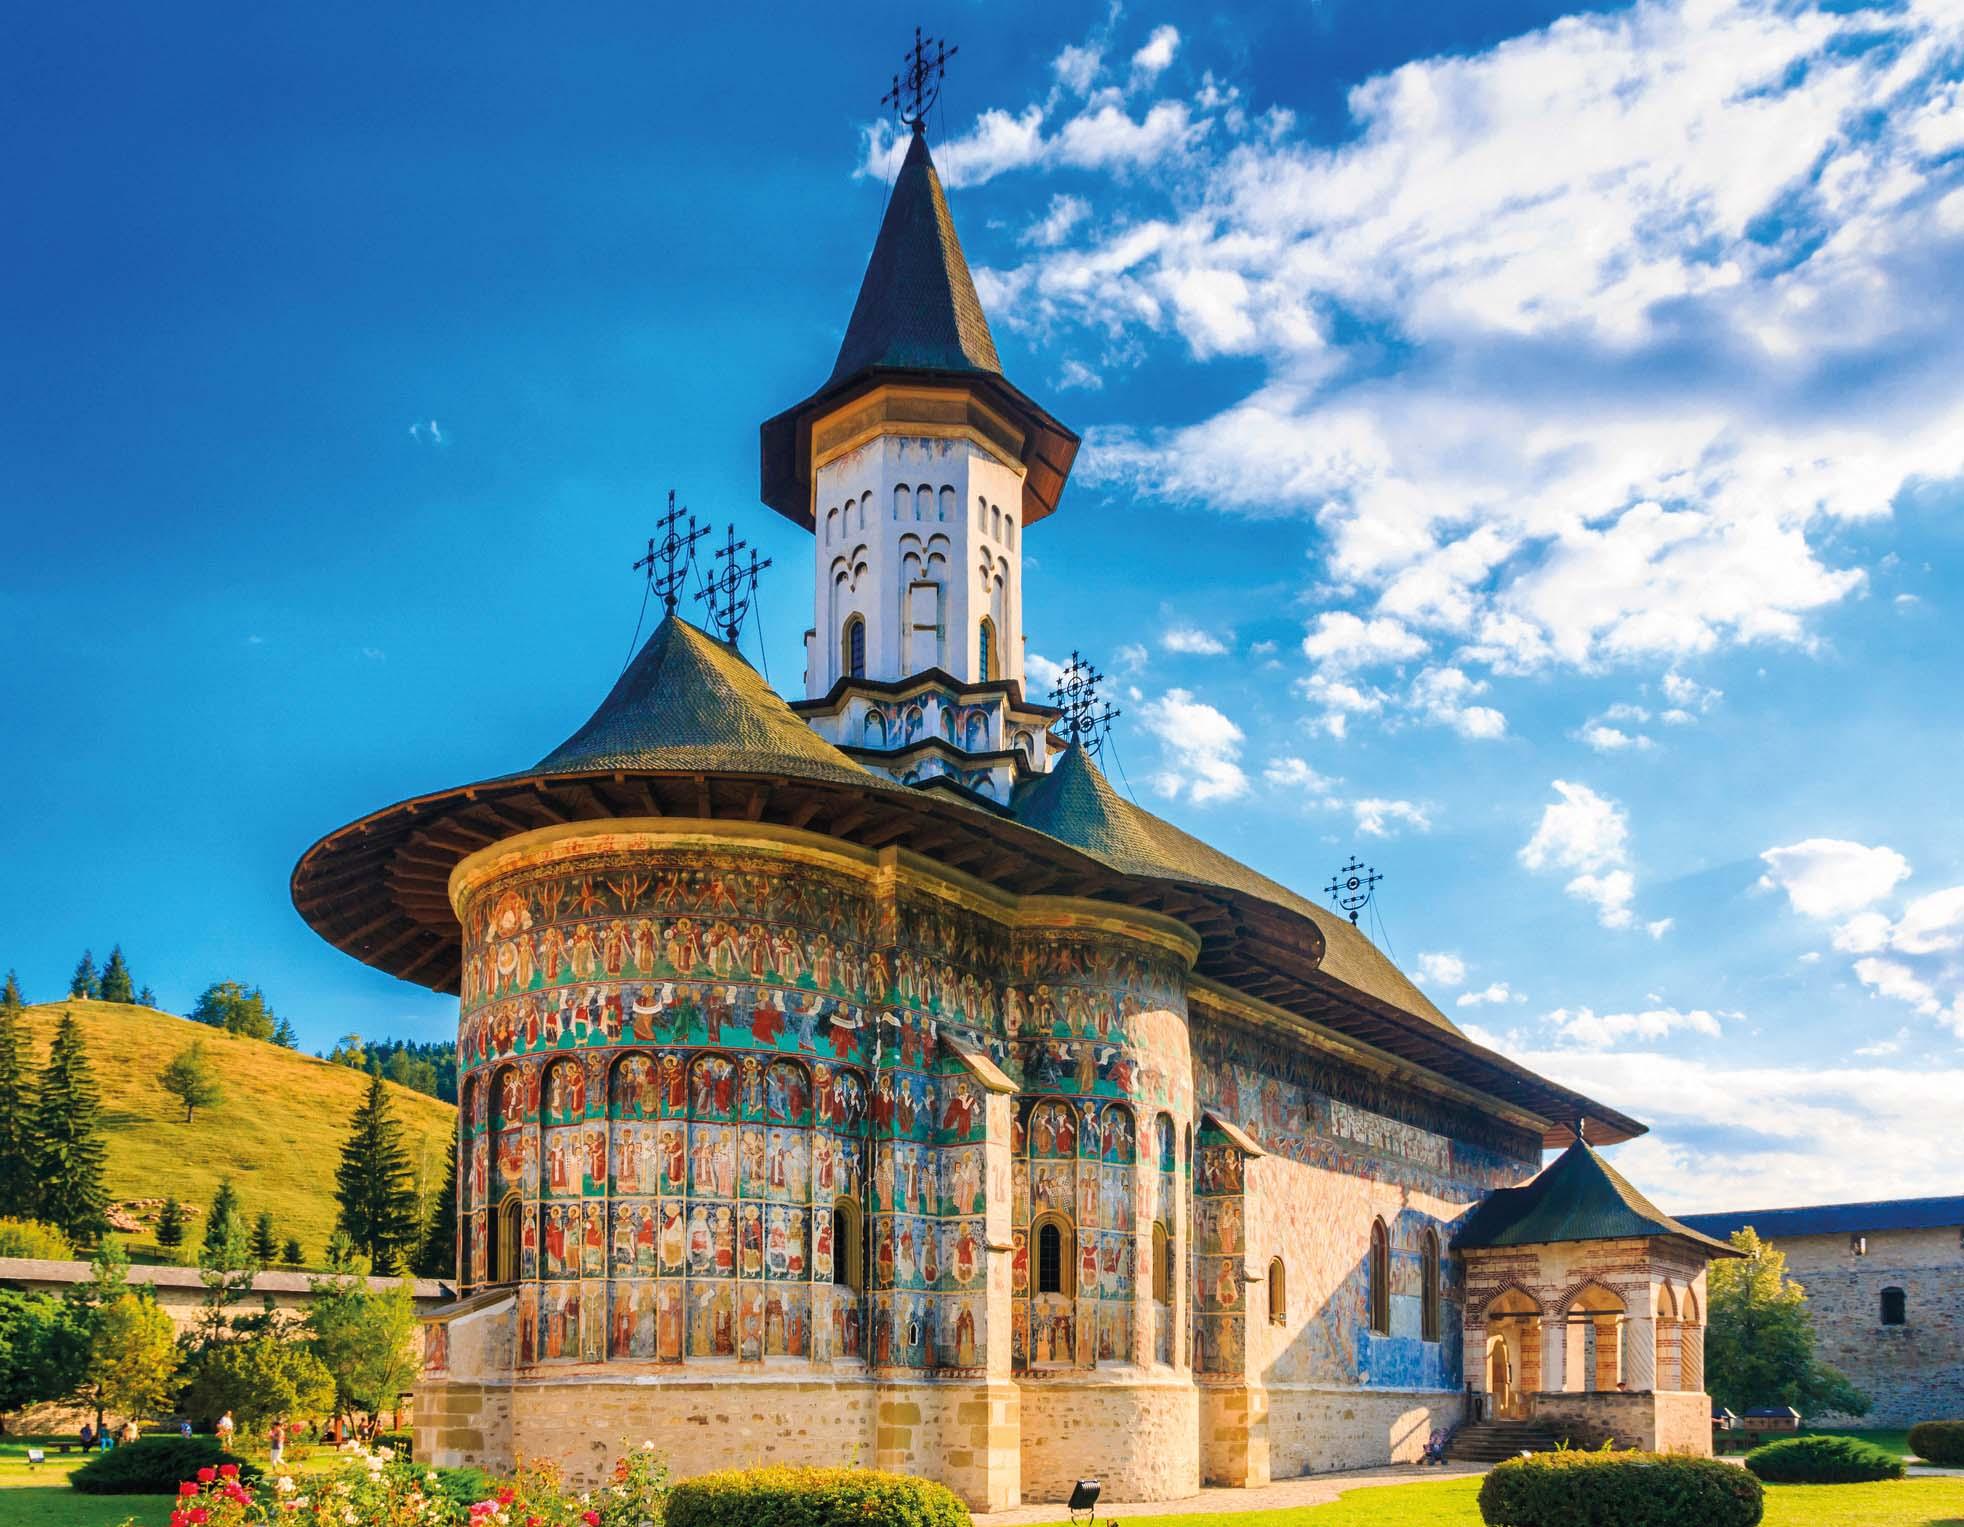 Rumänien, Moldaukloster